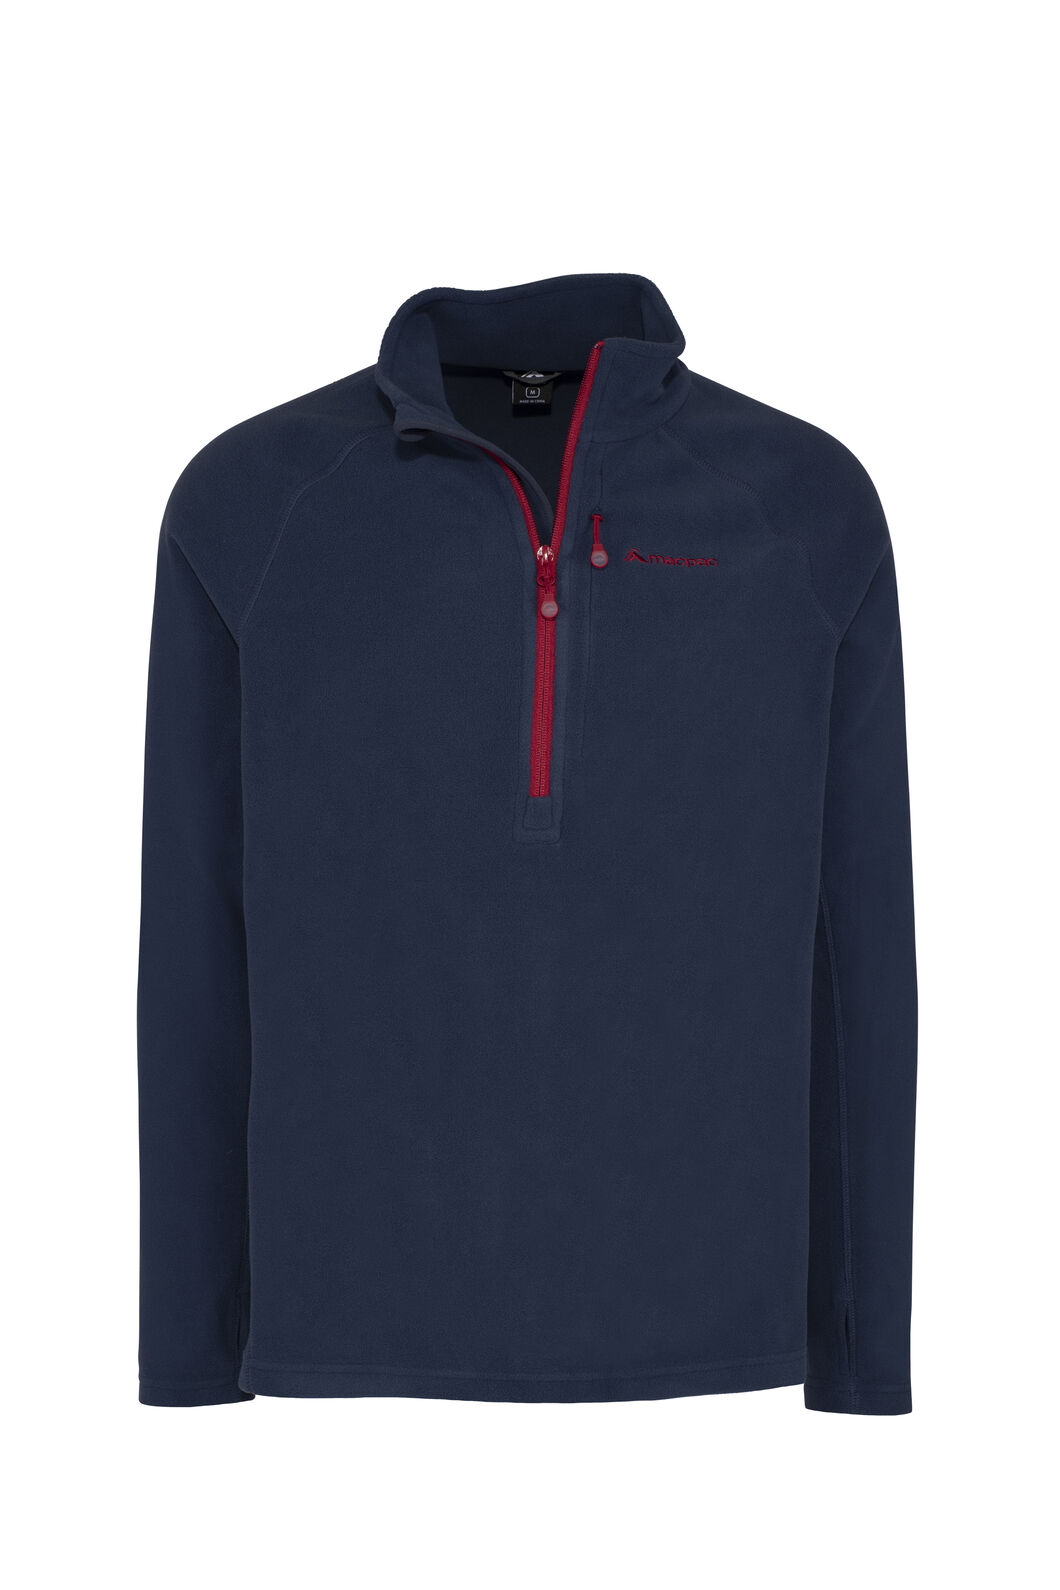 Macpac Tui Polartec® Micro Fleece® Pullover — Men's, Black Iris/Rio Red, hi-res